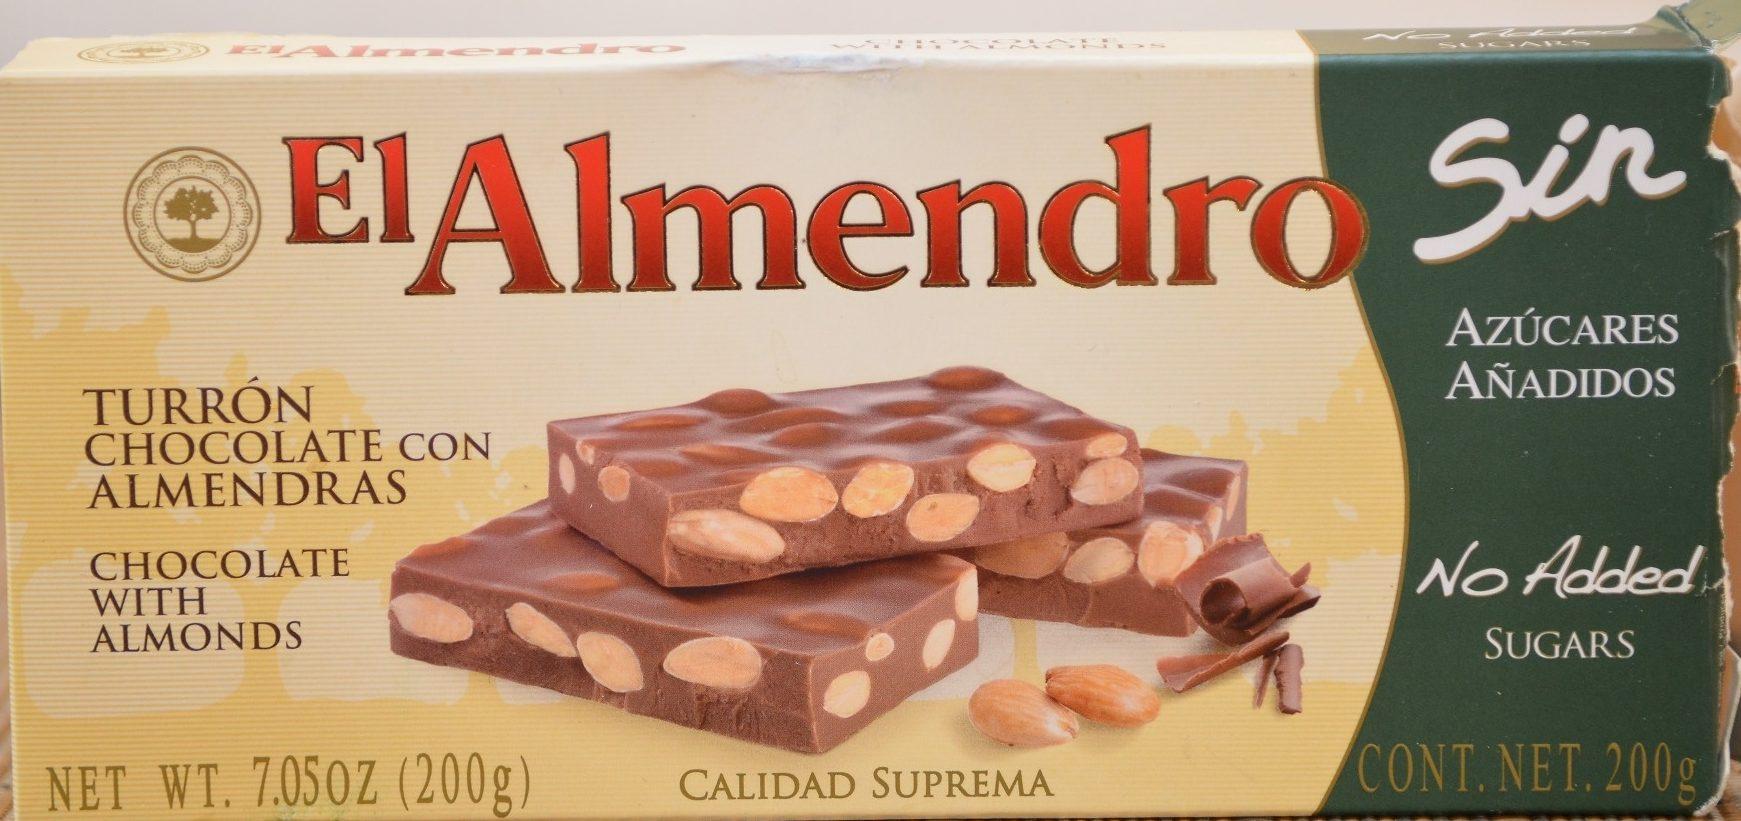 Turrón chocolate con almendras - Producto - fr